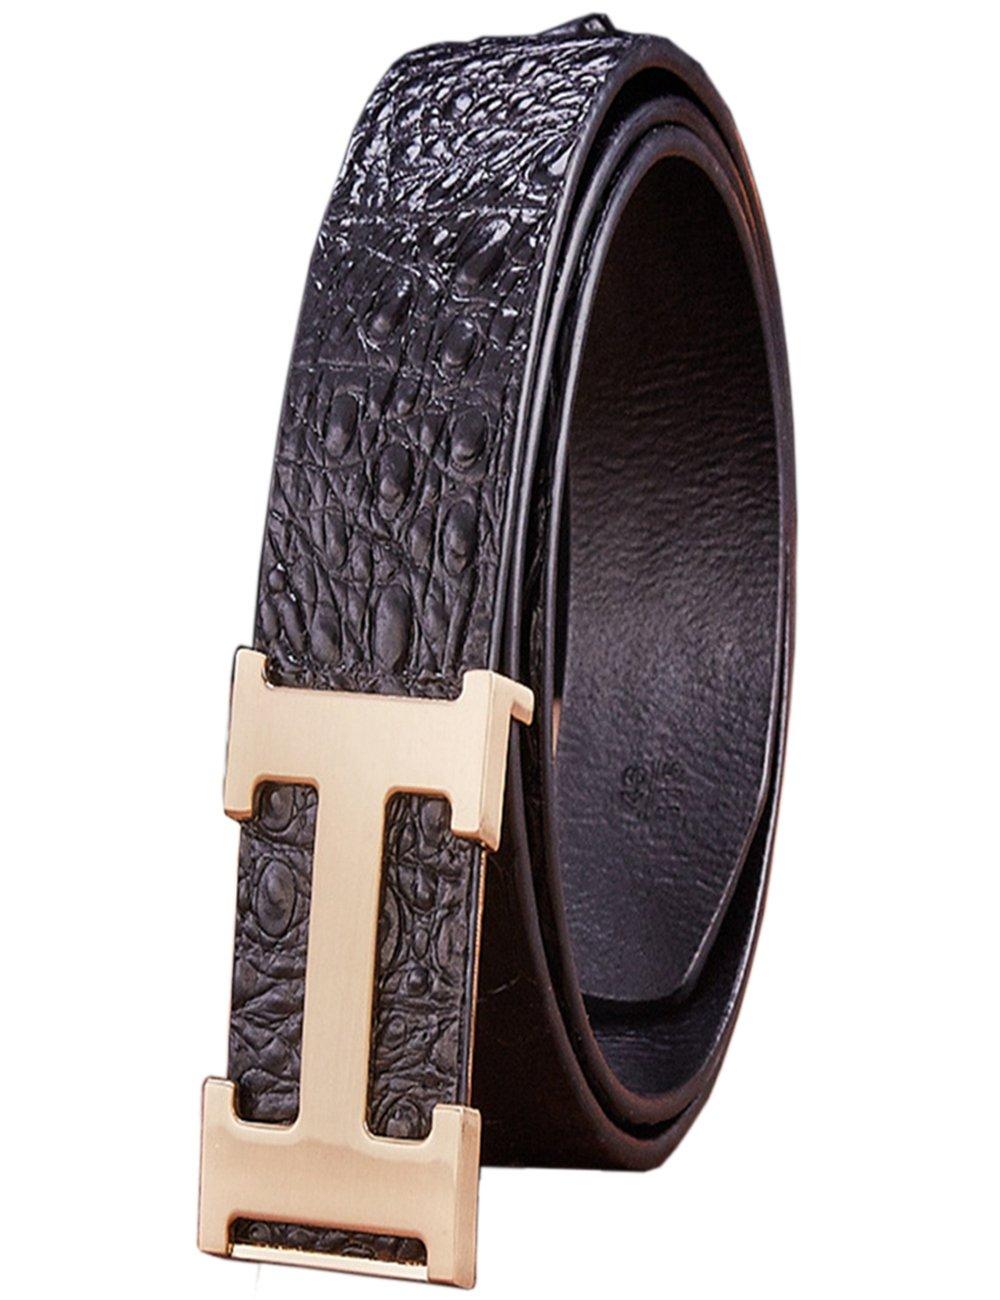 Menschwear Men's Geniune Leather Adjustable Belt with Slide Metal Buckle 38mm Black